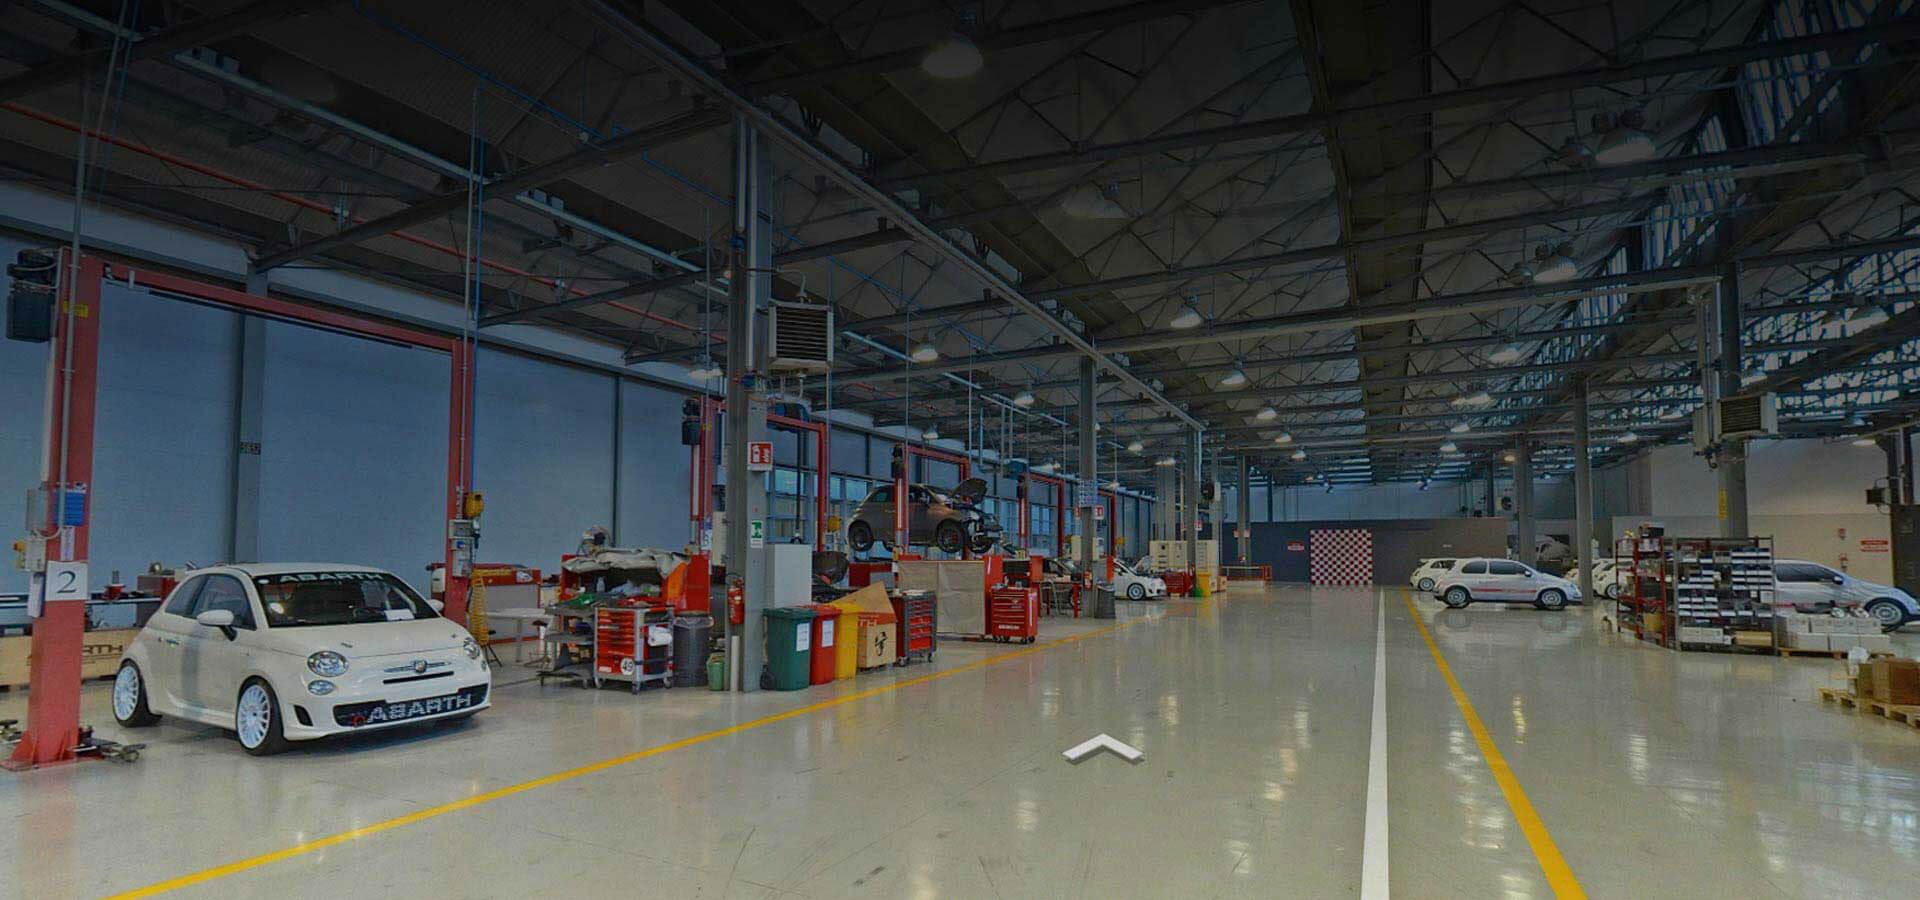 Abarth Cars UK | Abarth Factory | Car Tuning